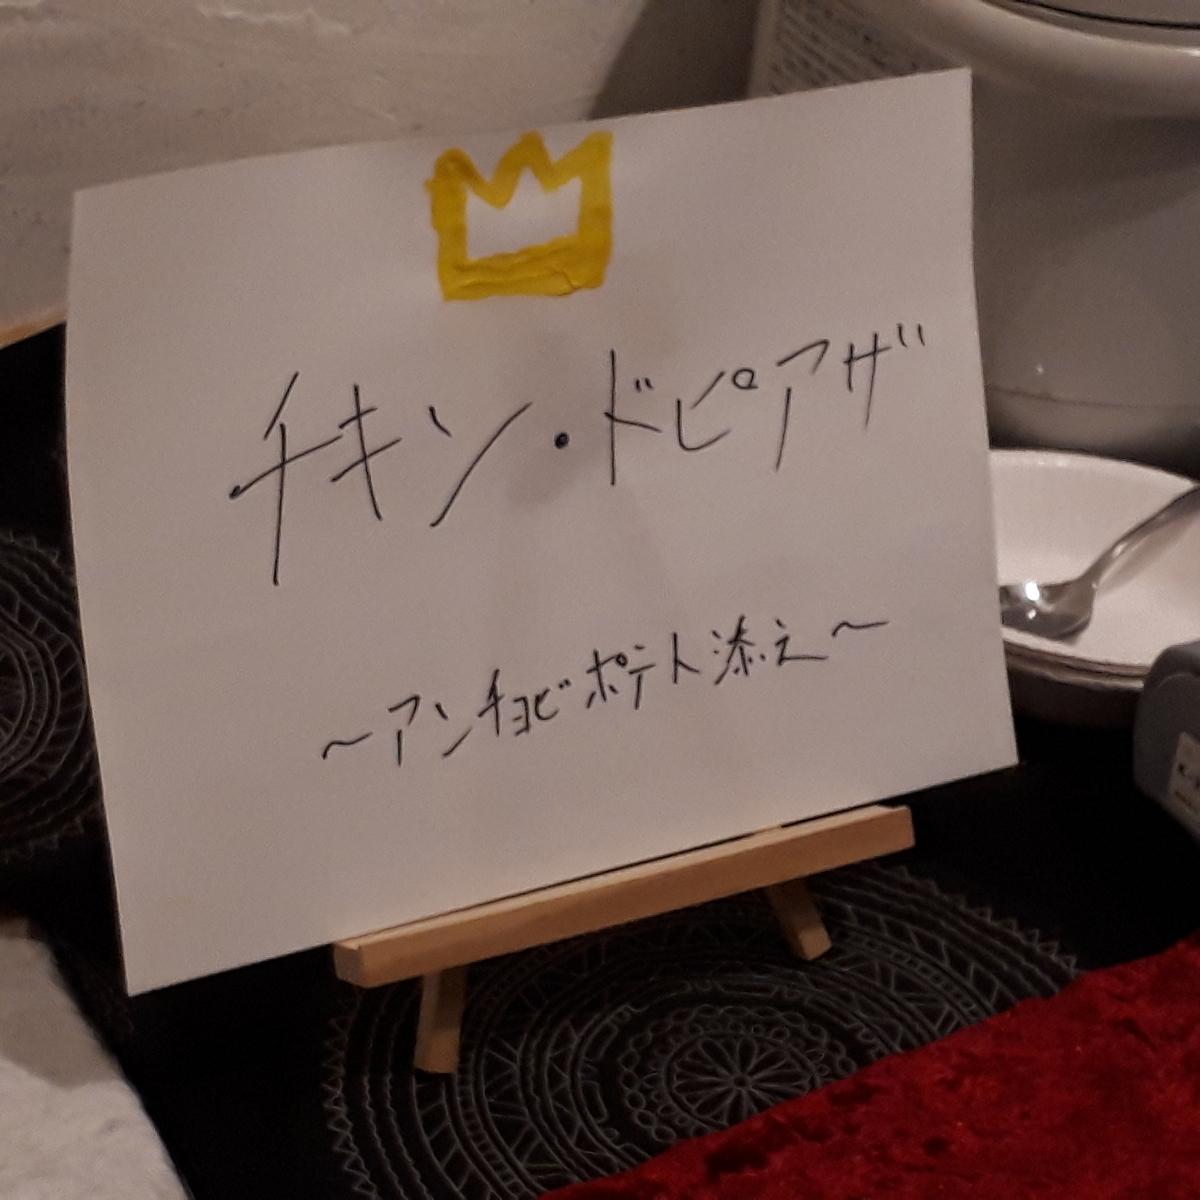 YELLOW TANJIER チキン・ドピアザ アンチョビポテト添え